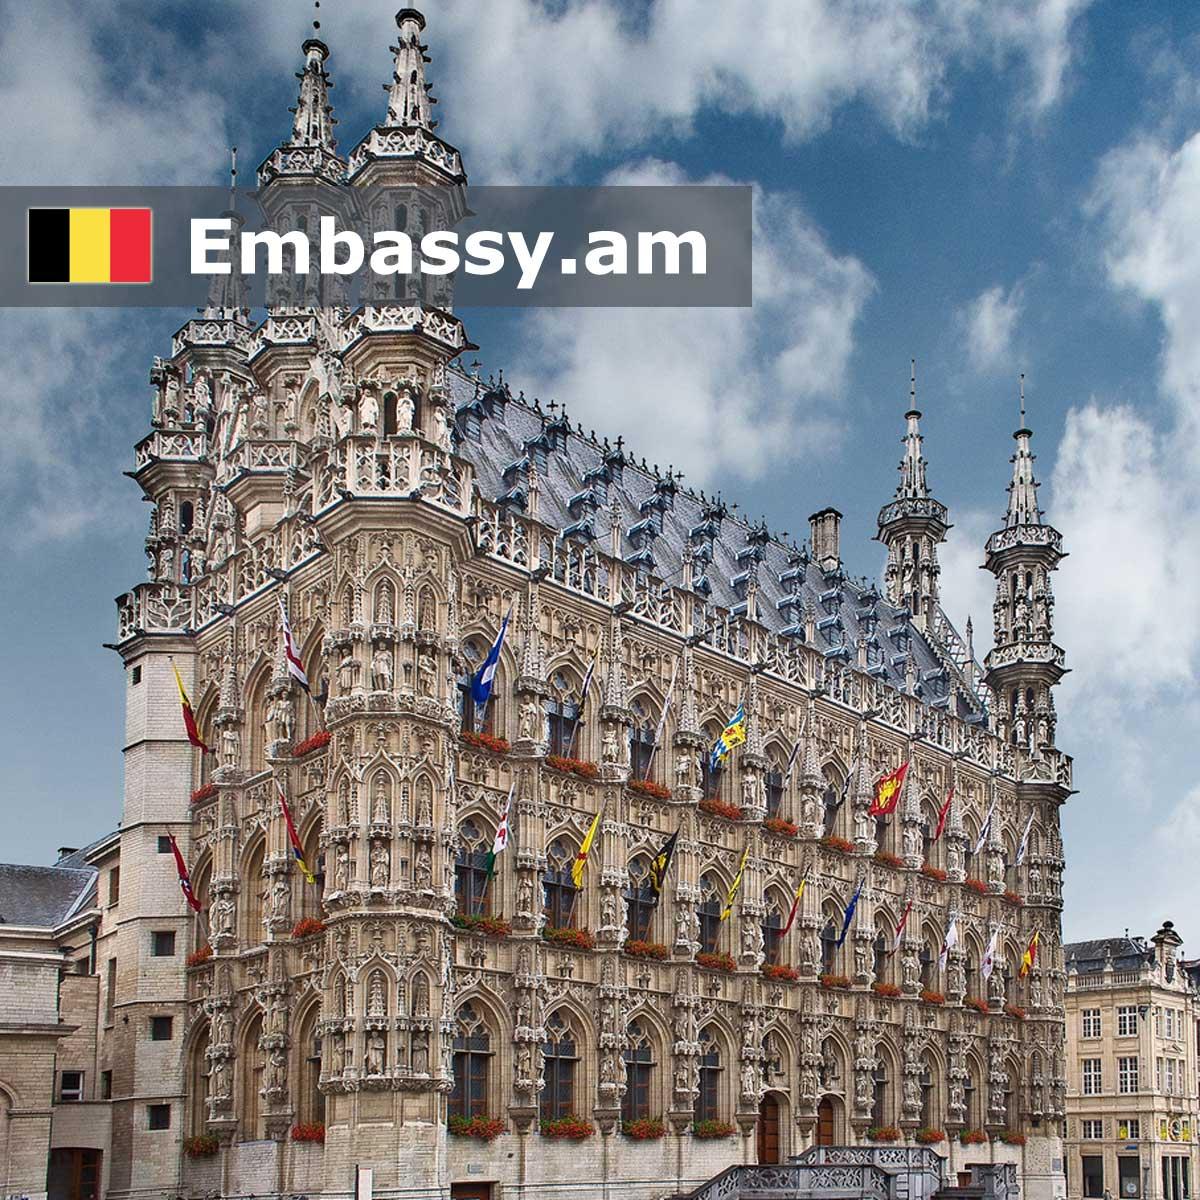 Leuven - Hotels in Belgium - Embassy.am